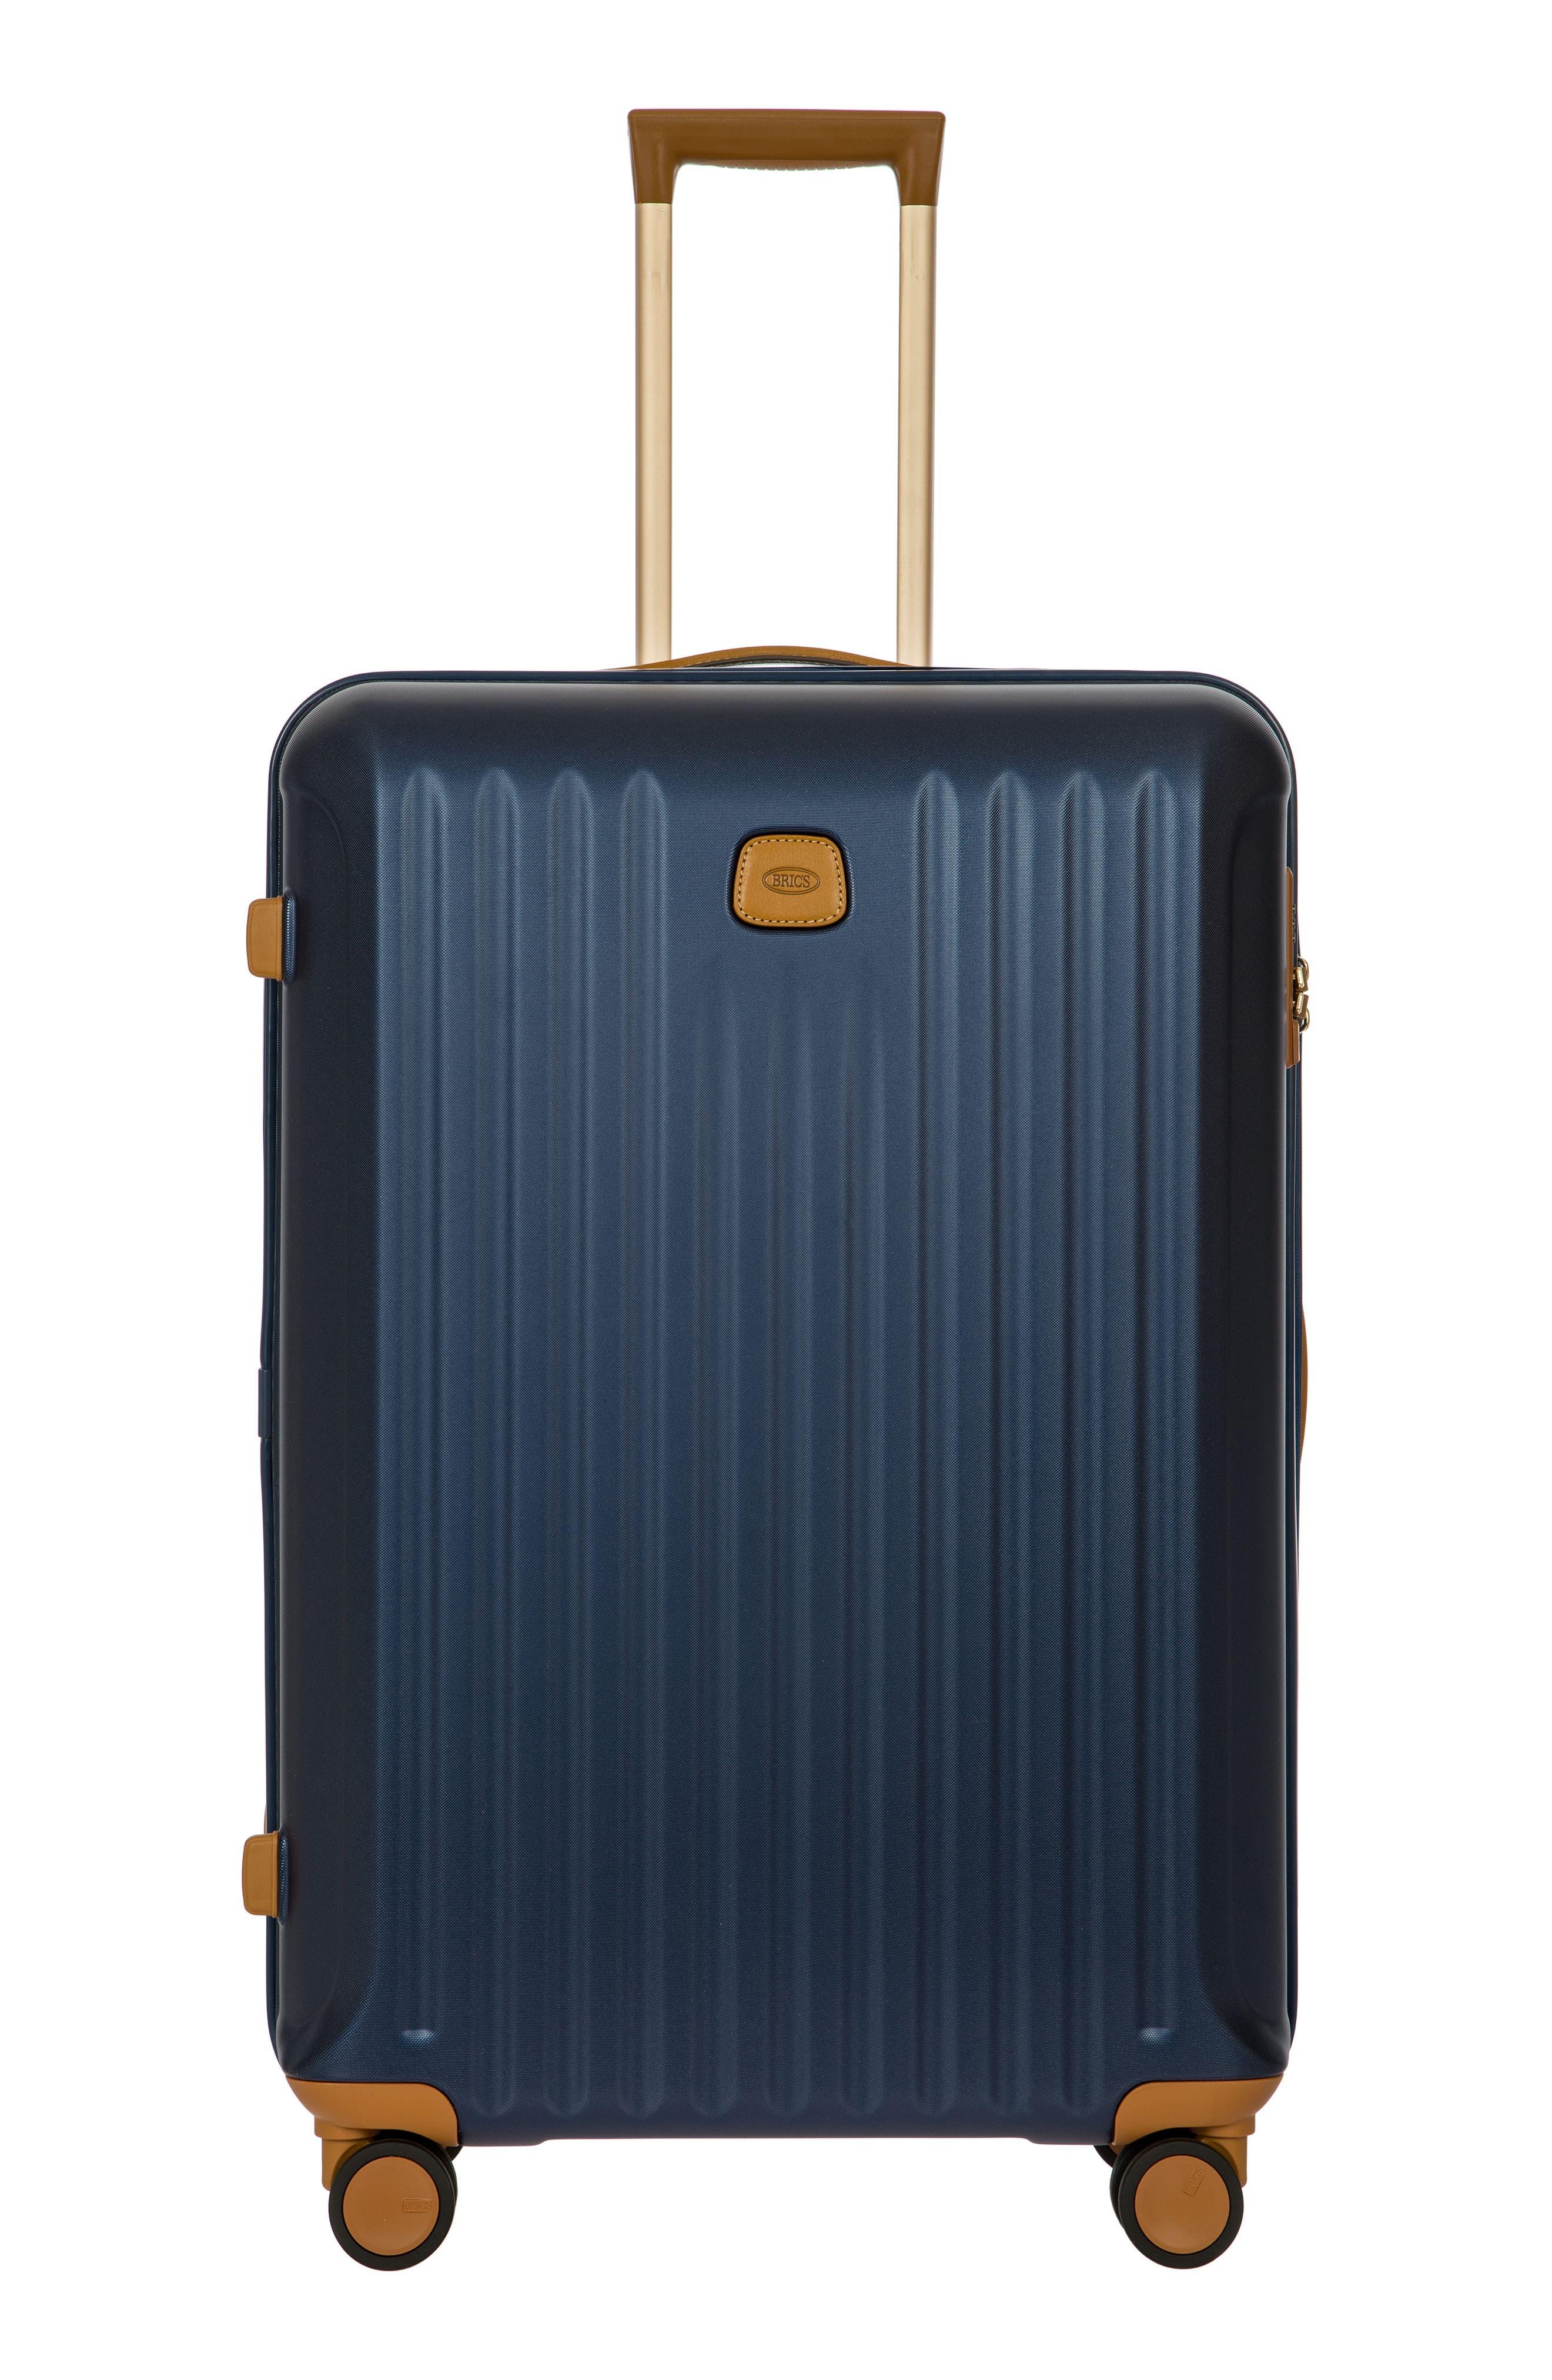 Capri 32-Inch Spinner Suitcase - Blue in Matte Blue